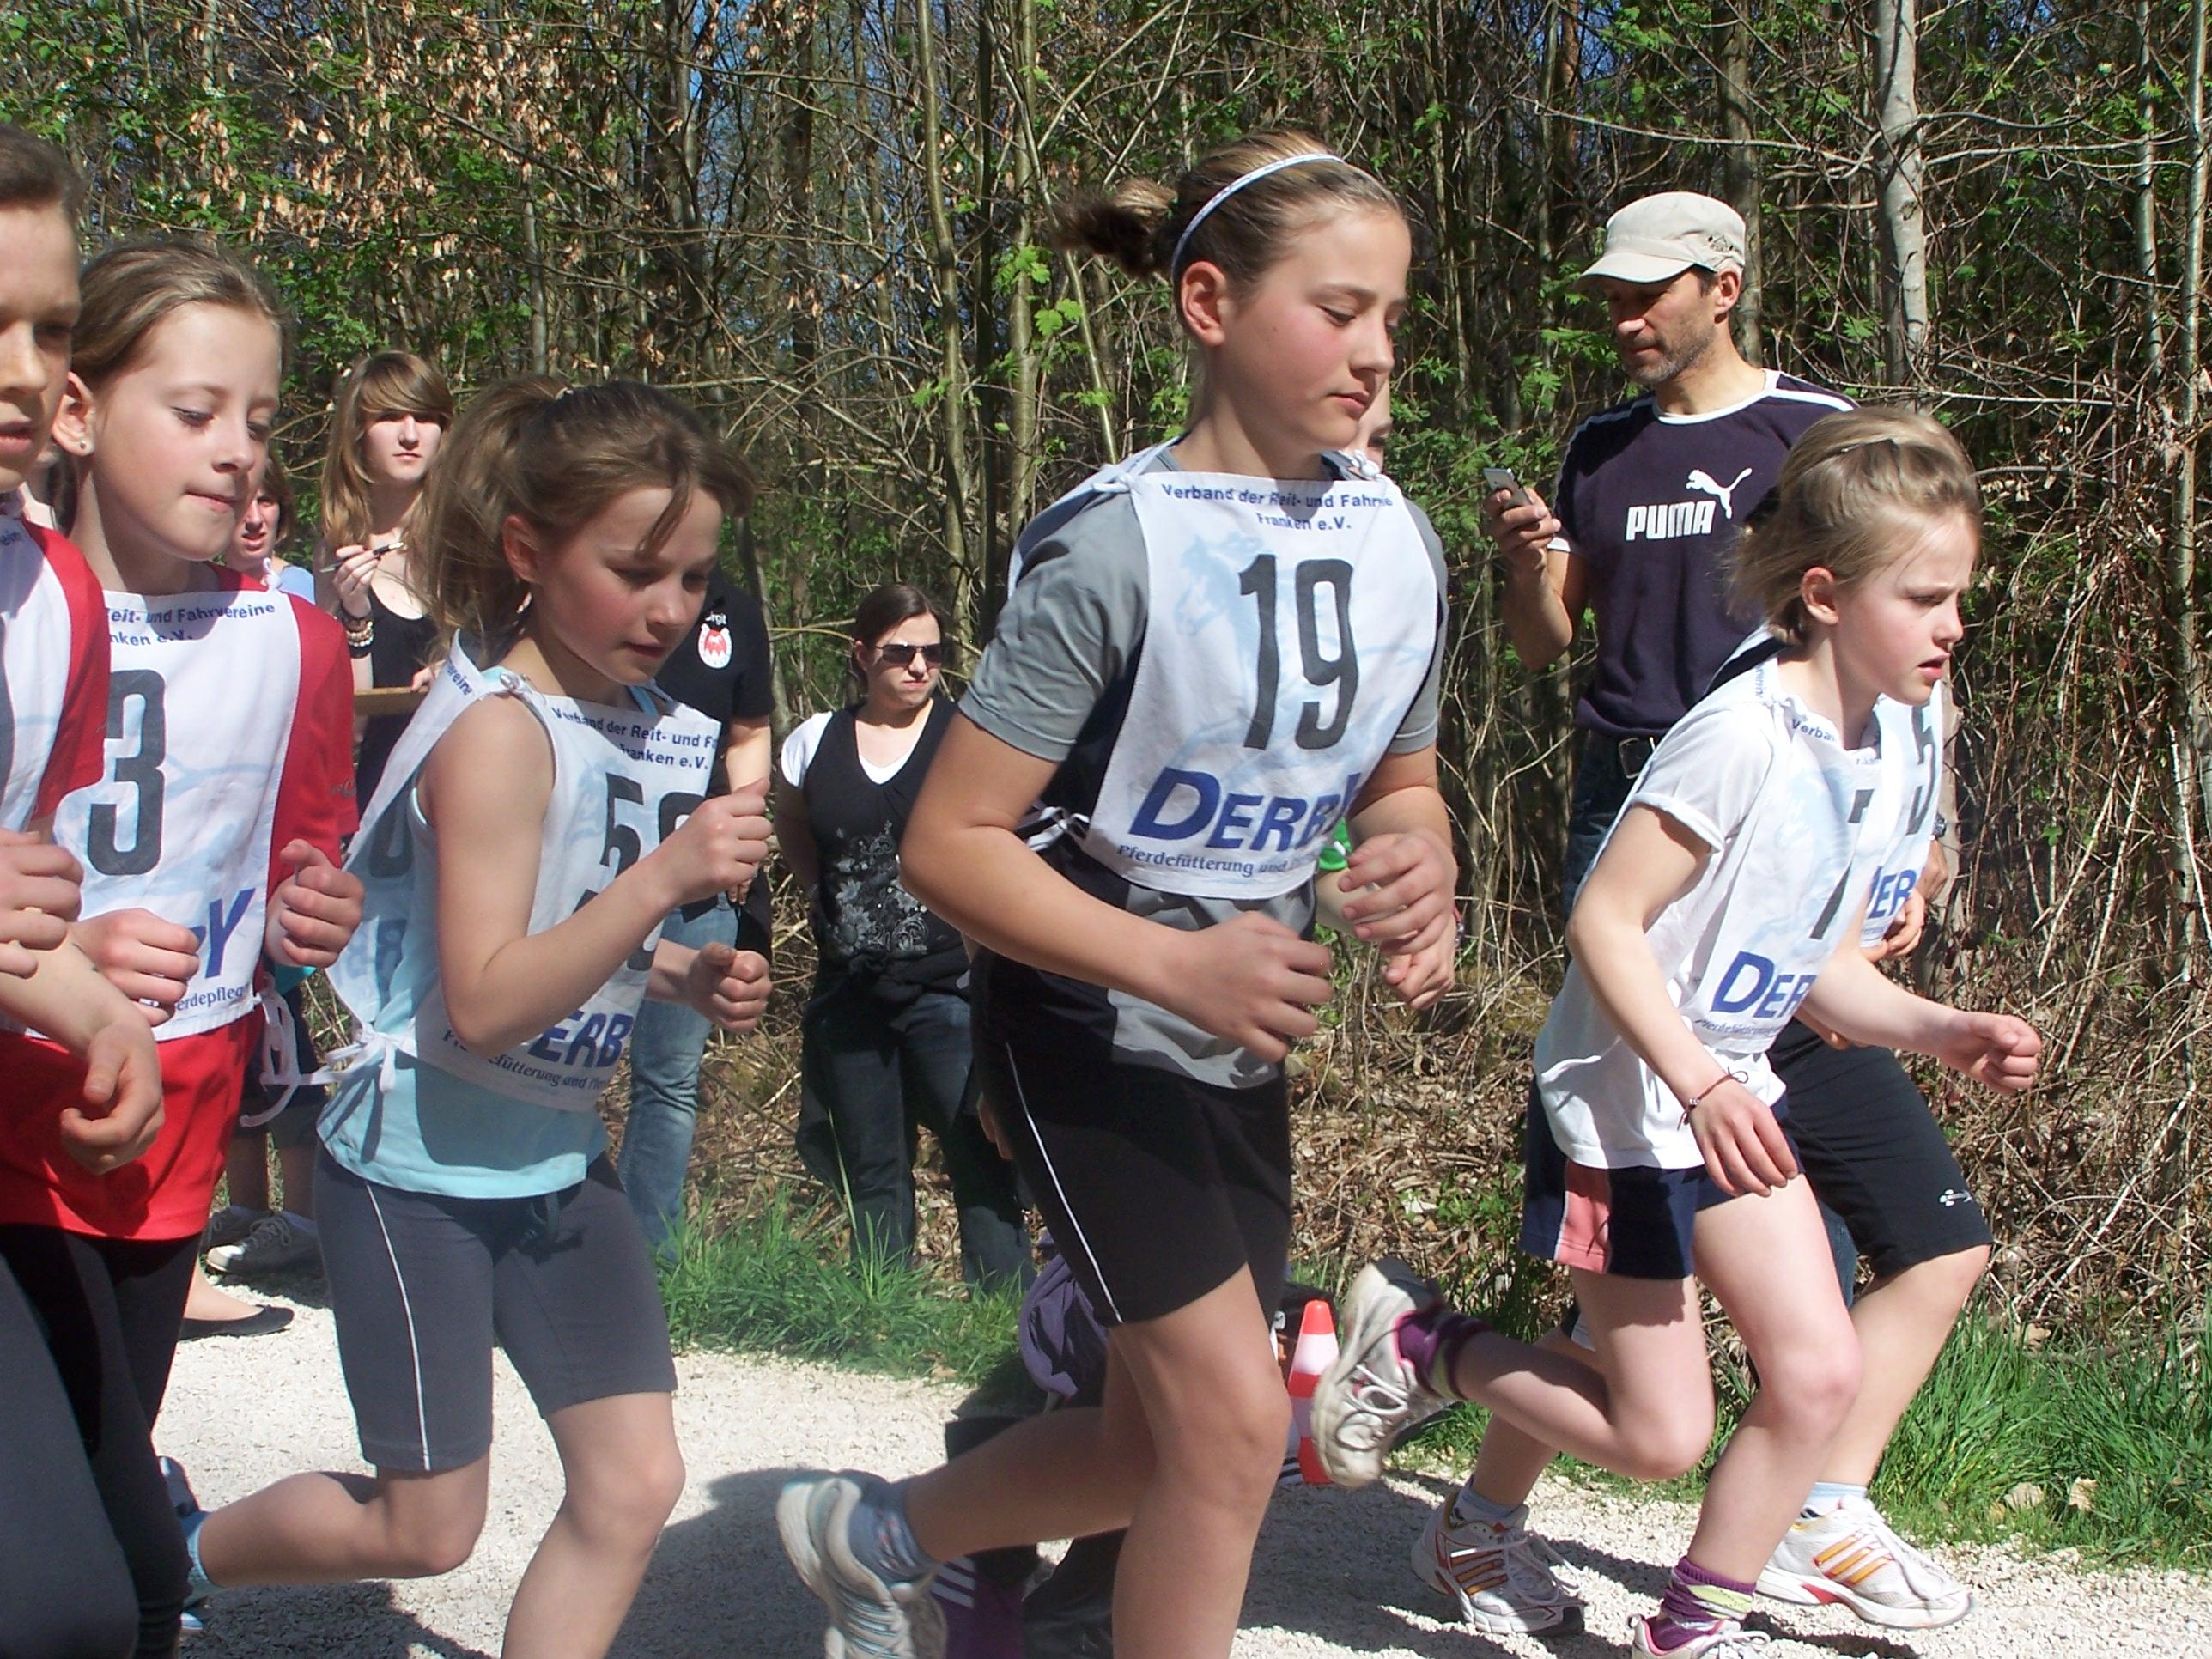 1. Disziplin Laufen